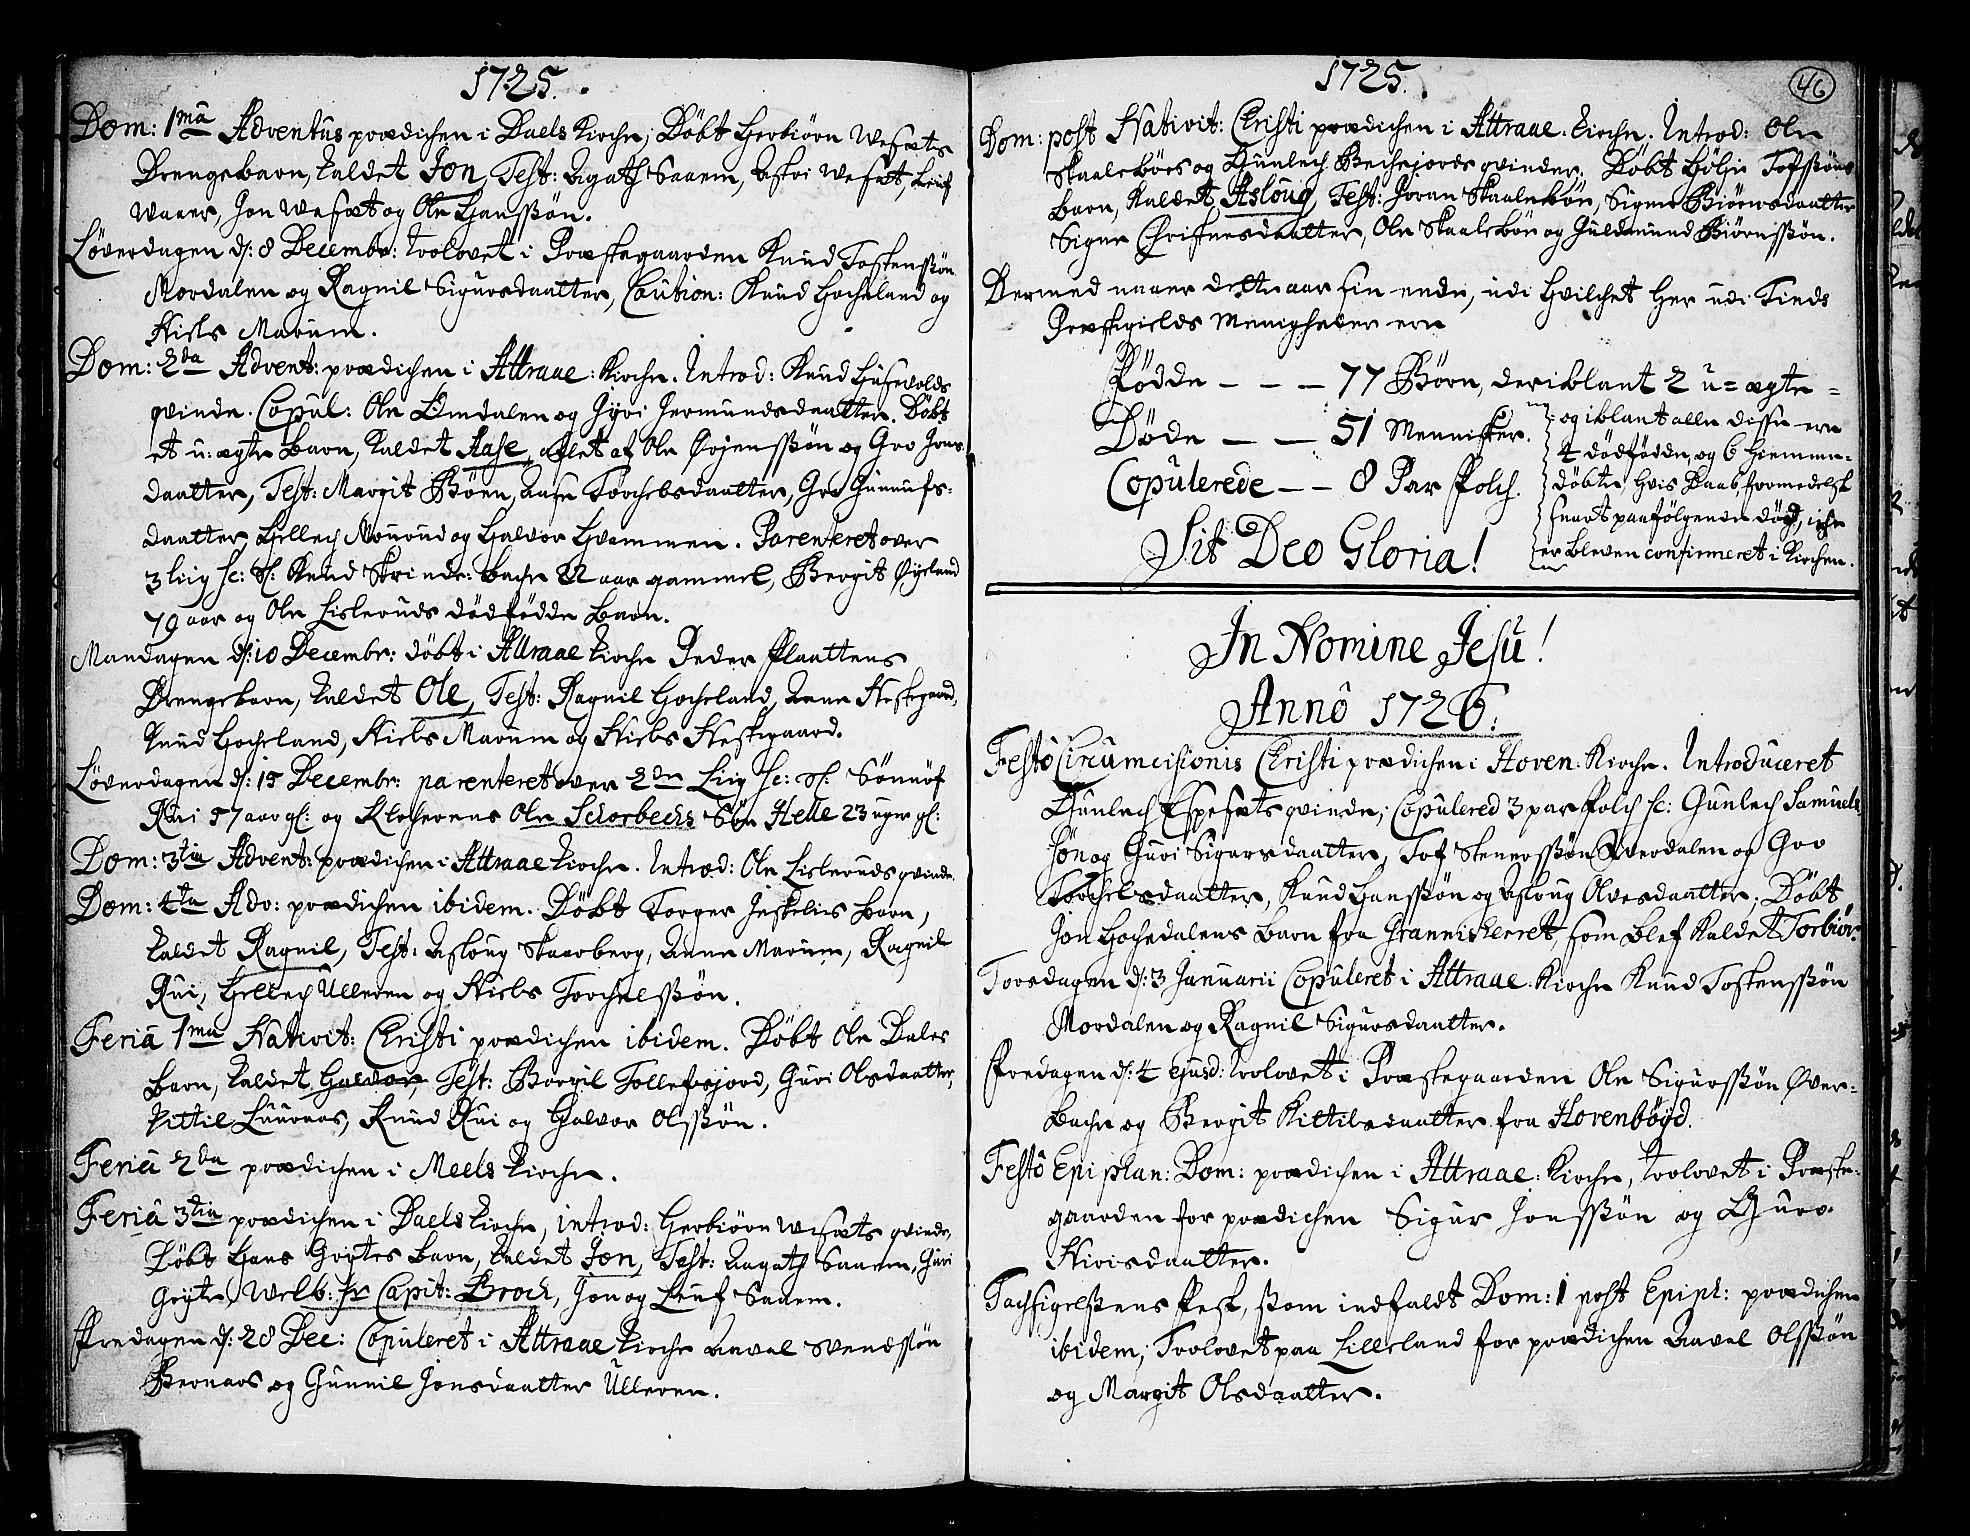 SAKO, Tinn kirkebøker, F/Fa/L0001: Ministerialbok nr. I 1, 1717-1734, s. 46